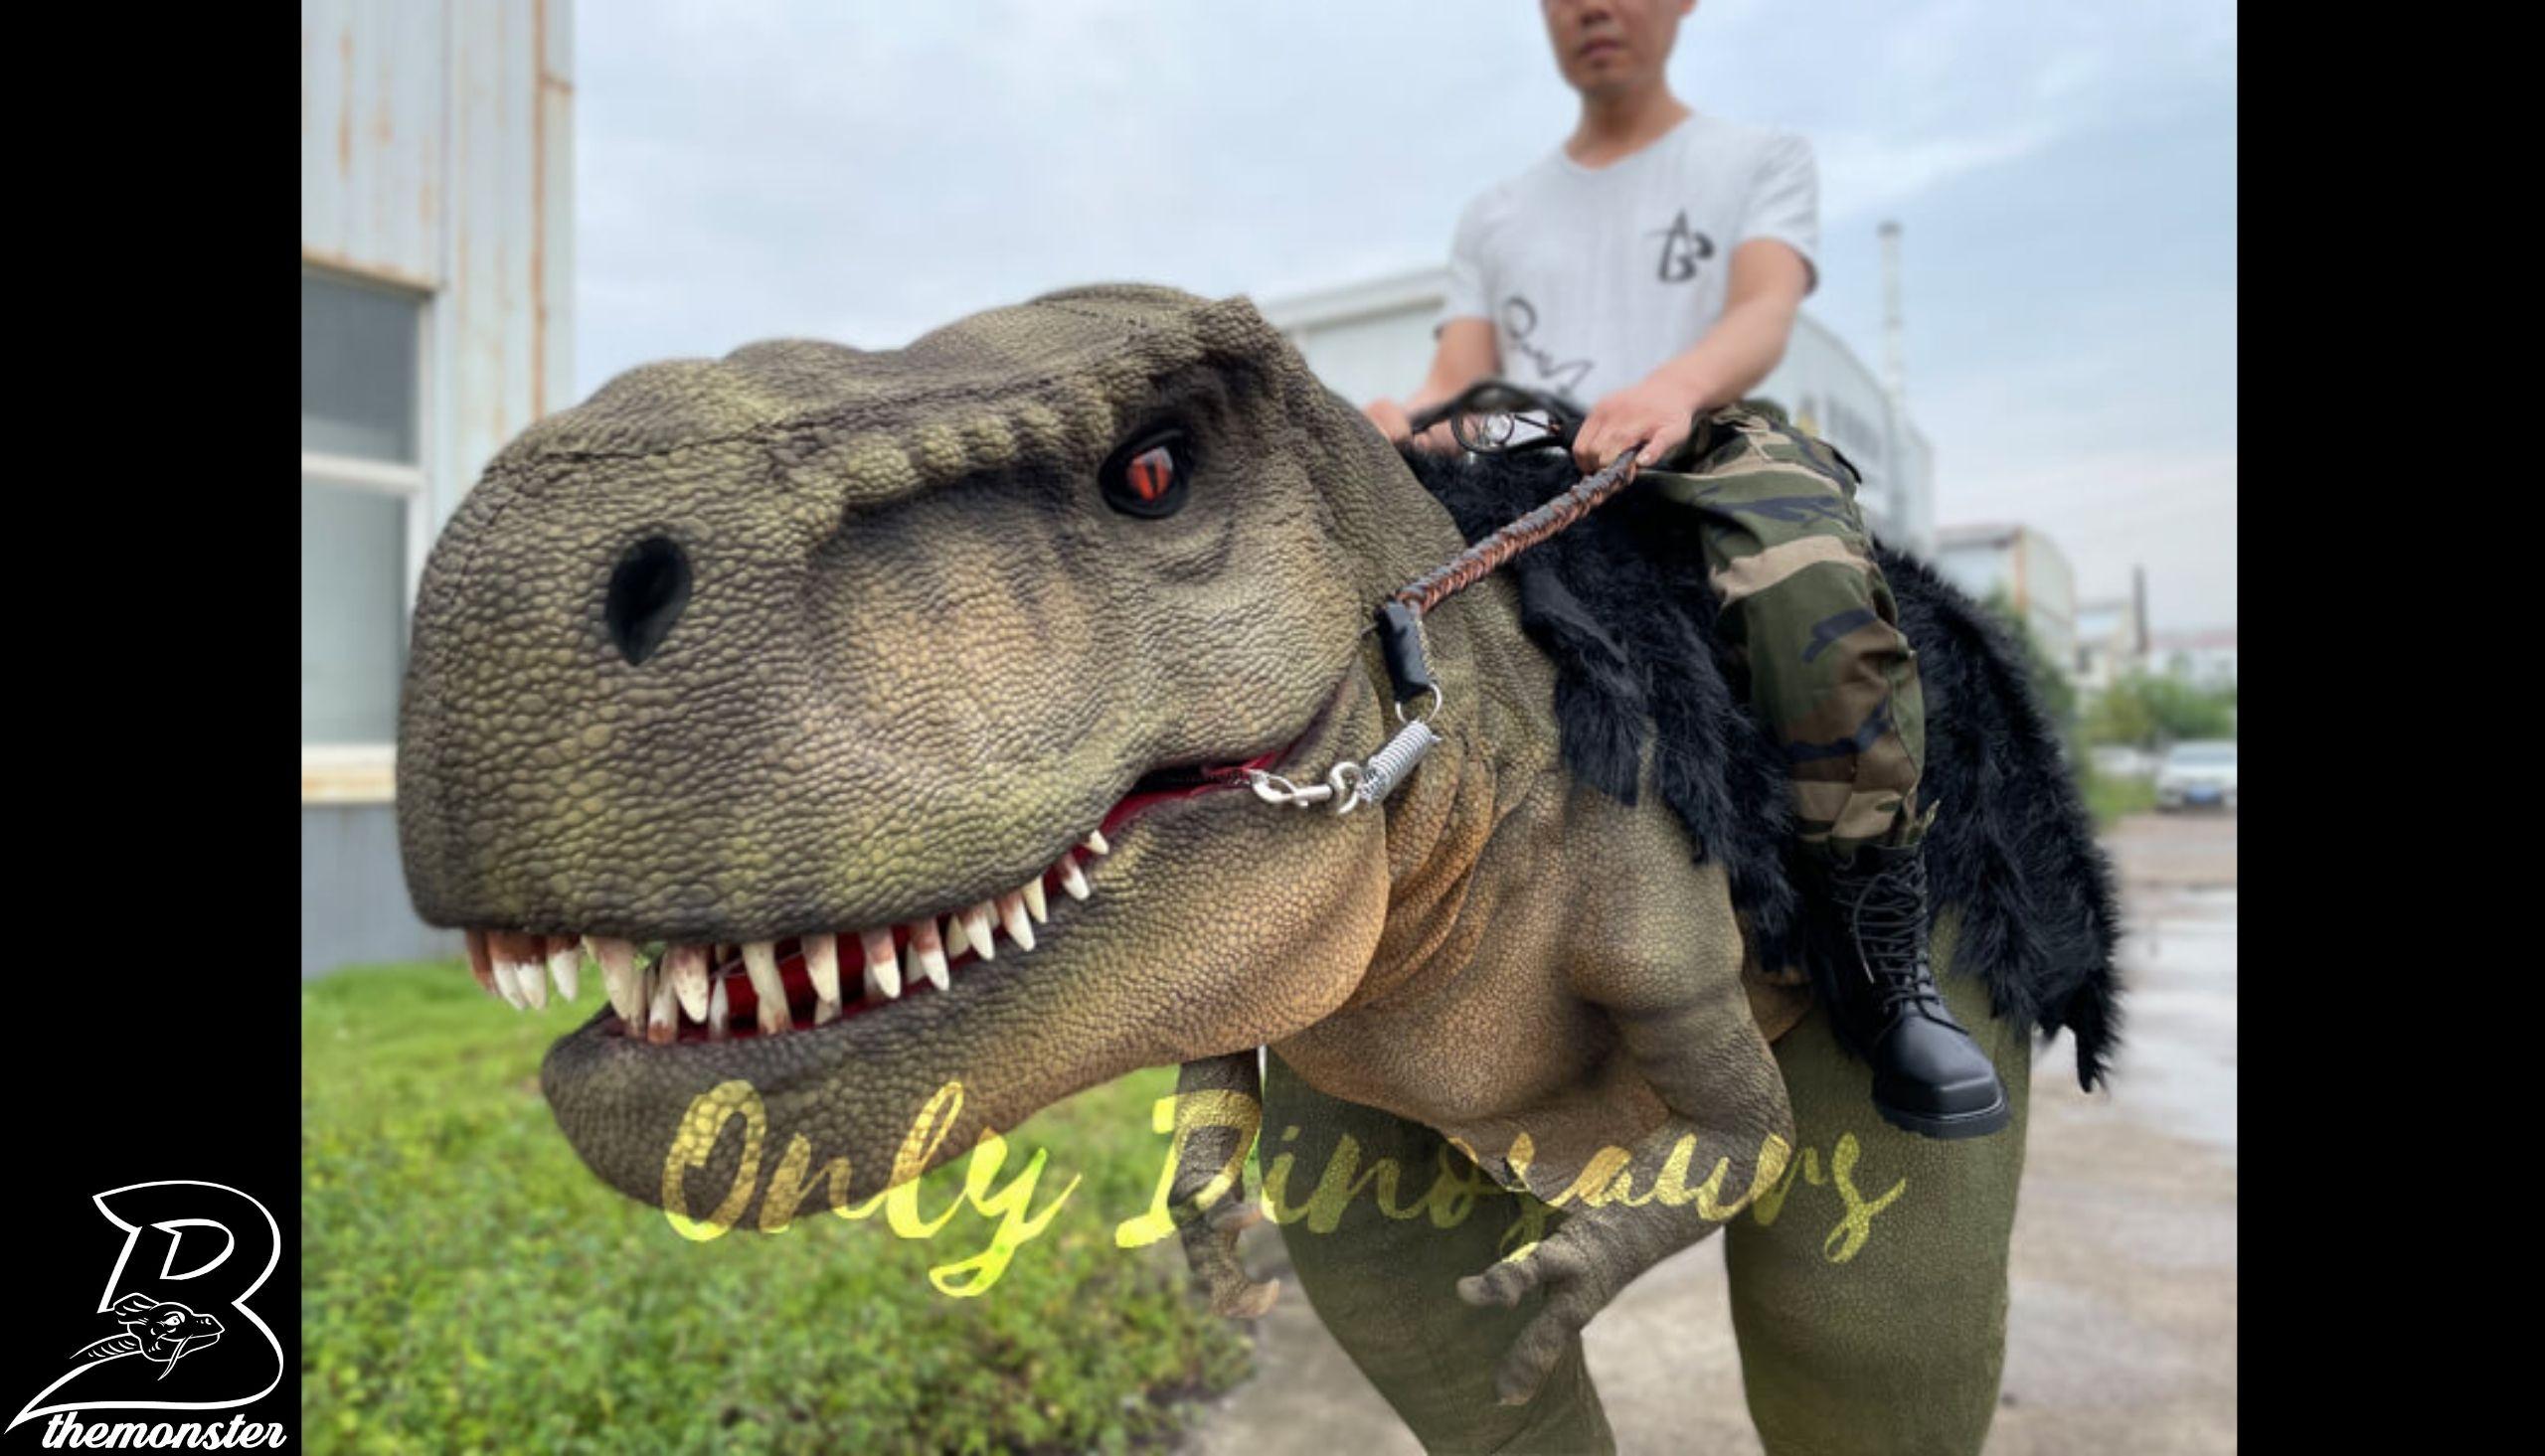 Realistic T-Rex Stilts Walking Dinosaur Costume in vendita sul Bthemonster.com